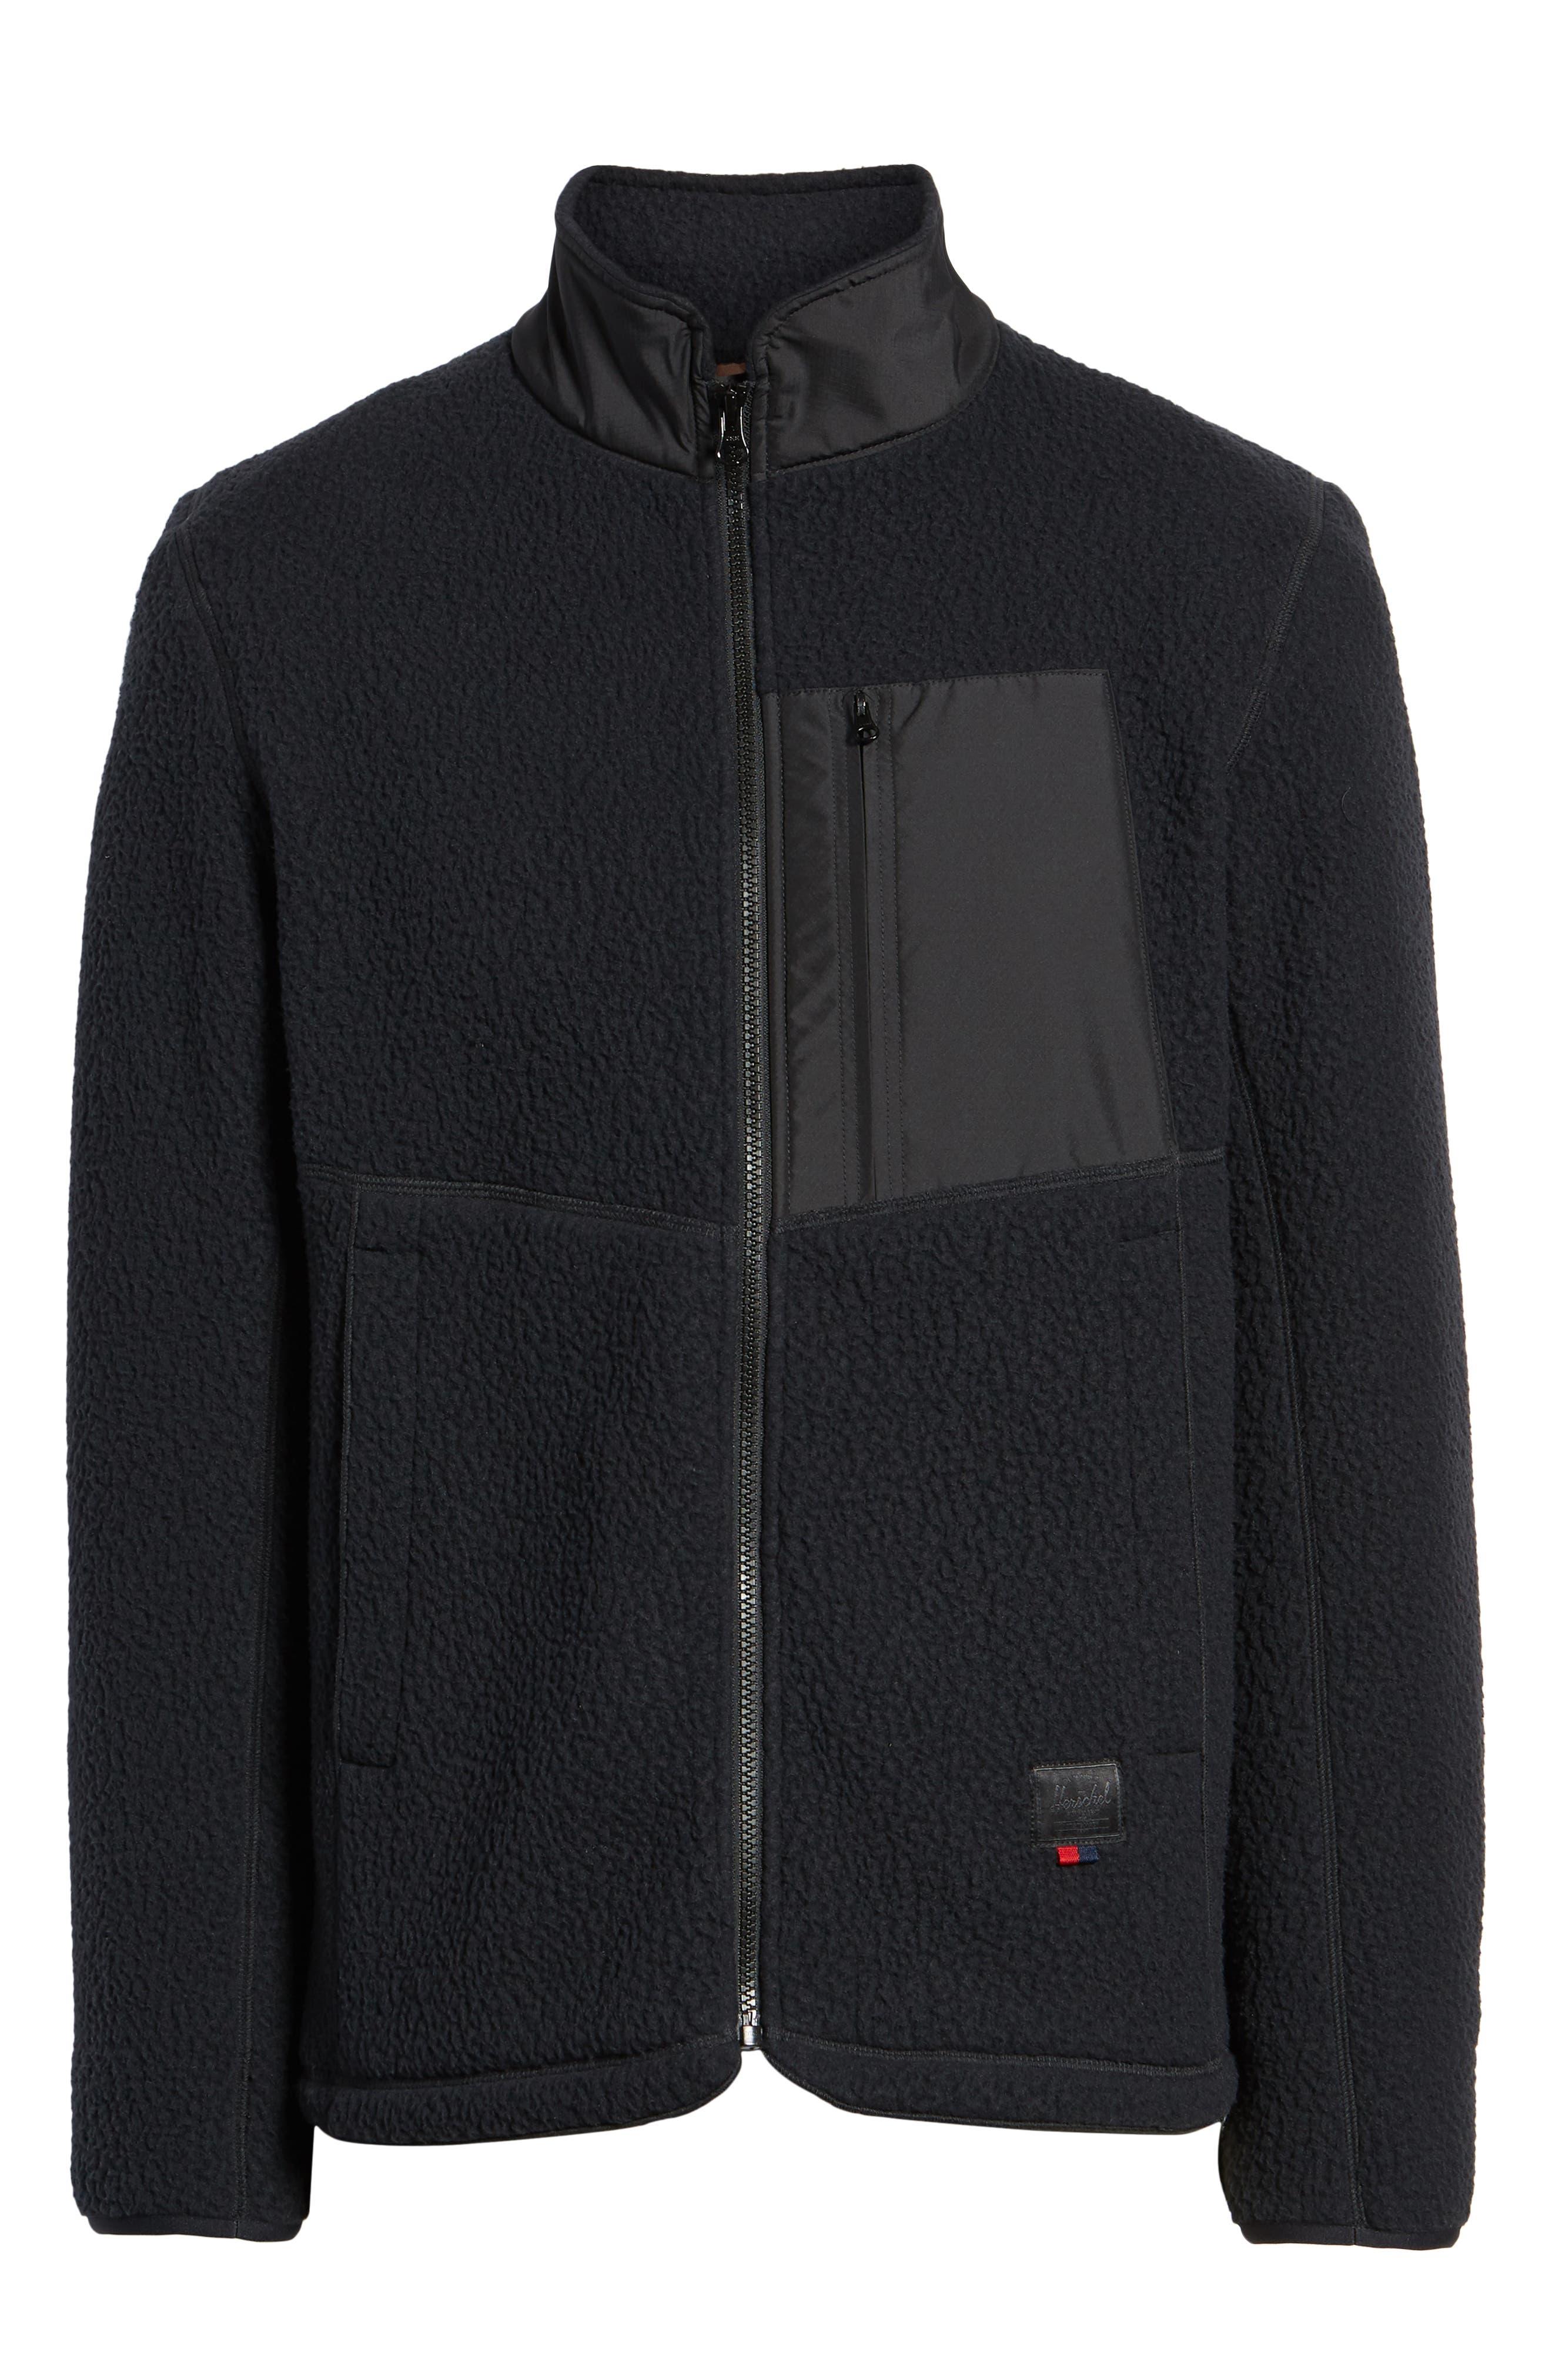 HERSCHEL SUPPLY CO.,                             Tech Fleece Jacket,                             Alternate thumbnail 6, color,                             001